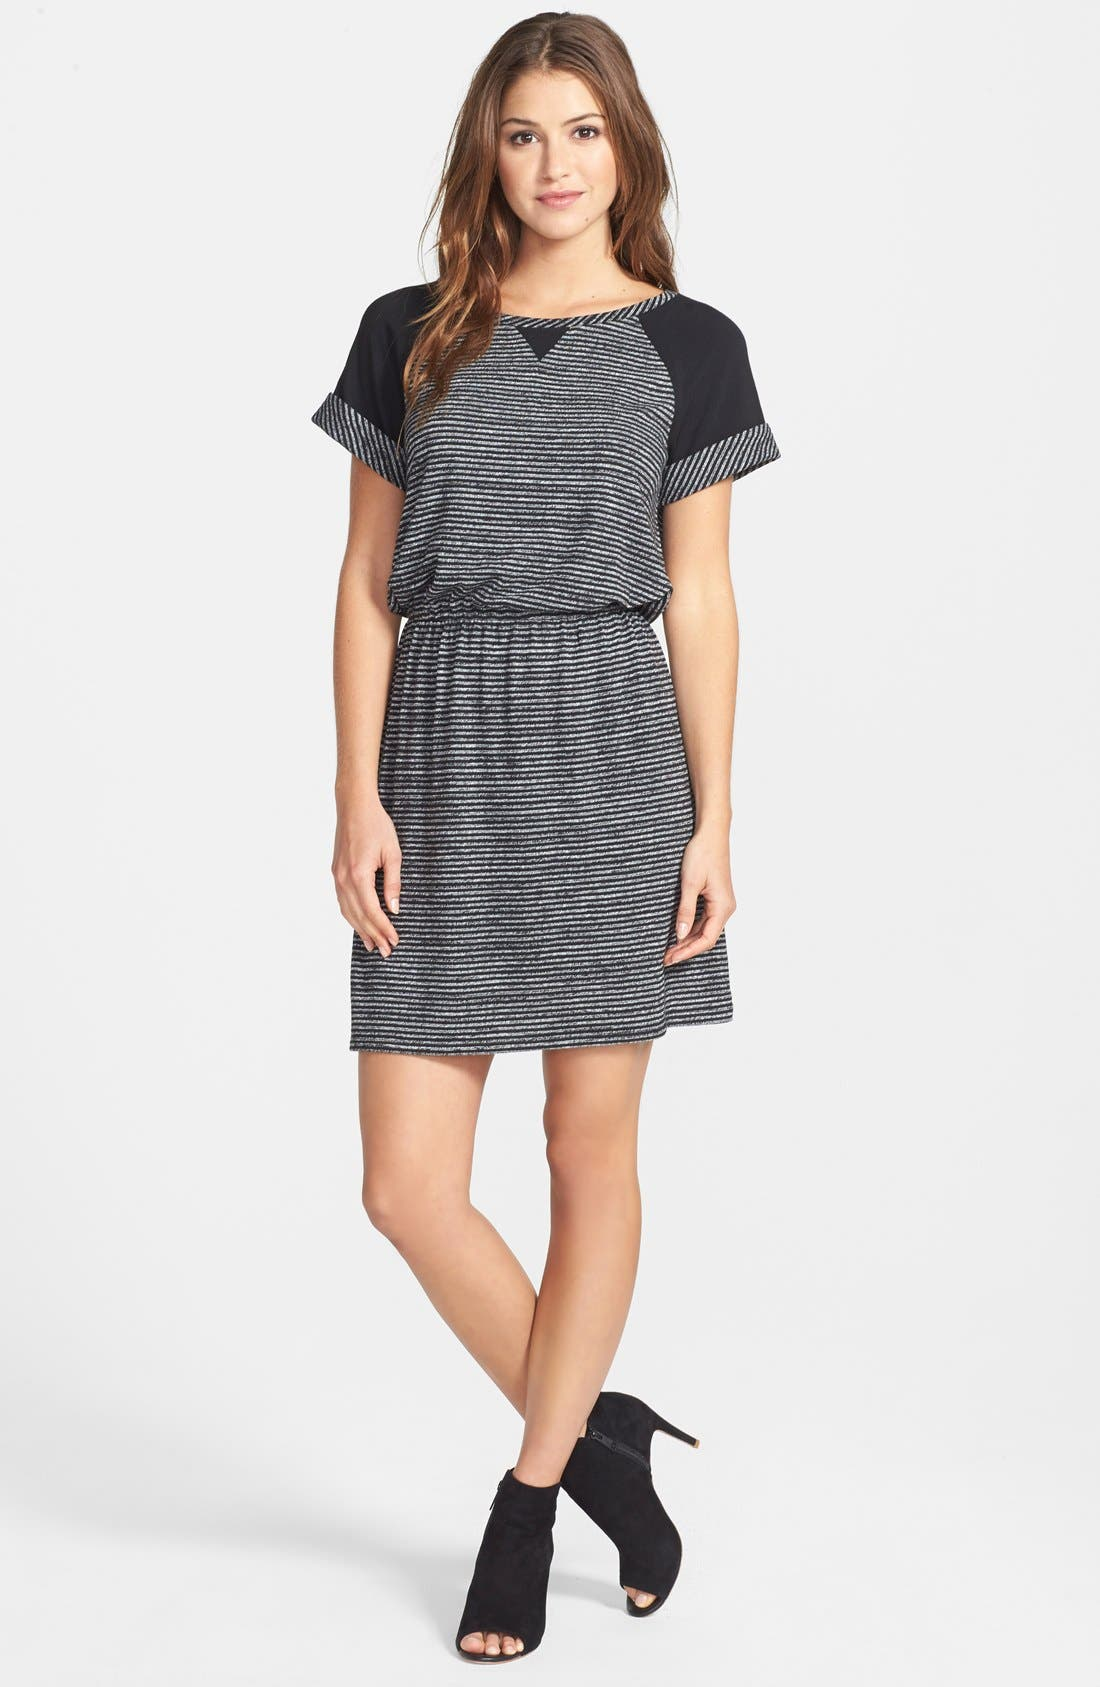 Alternate Image 1 Selected - Caslon® Colorblock Stripe Blouson Dress (Regular & Petite)